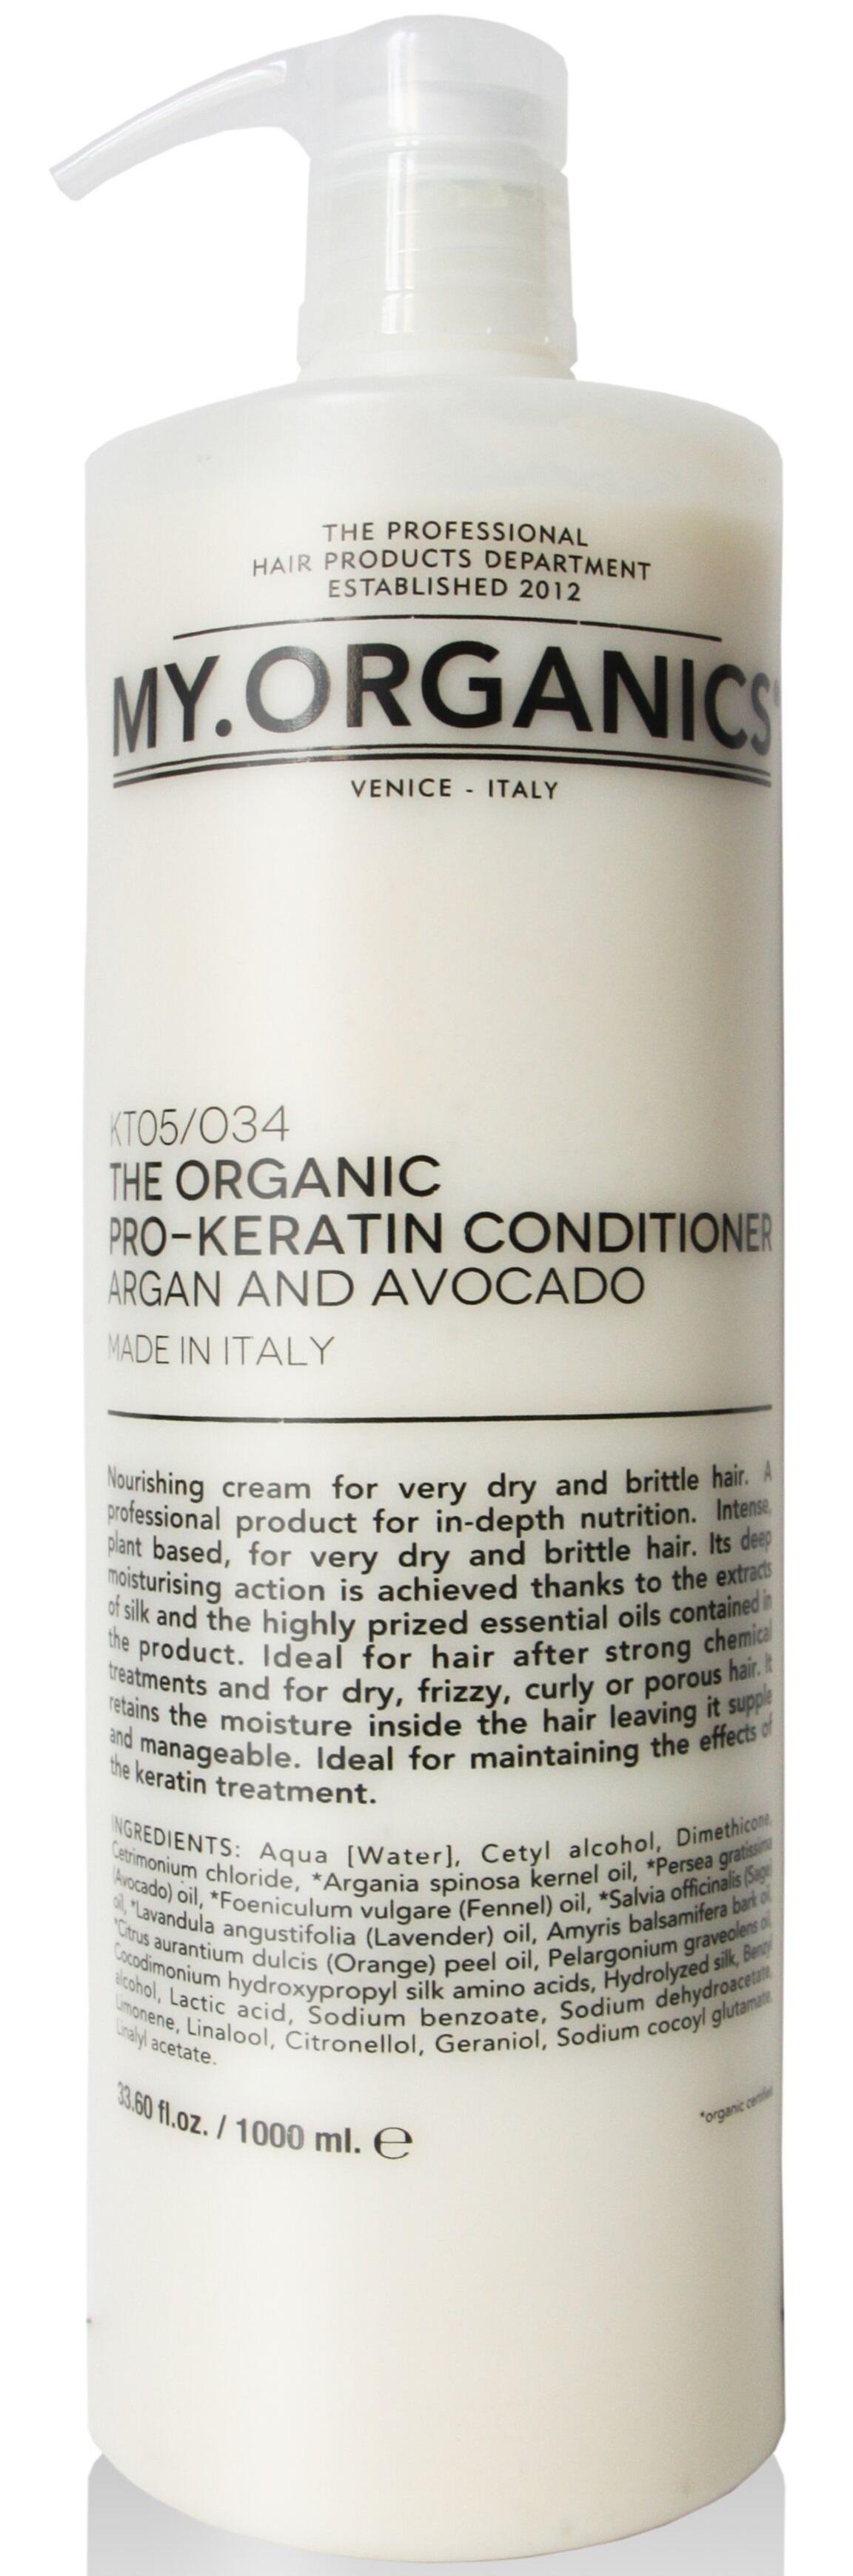 MY.ORGANICS The Organic Pro-Keratin Conditioner Argan And Avocado 1000ml